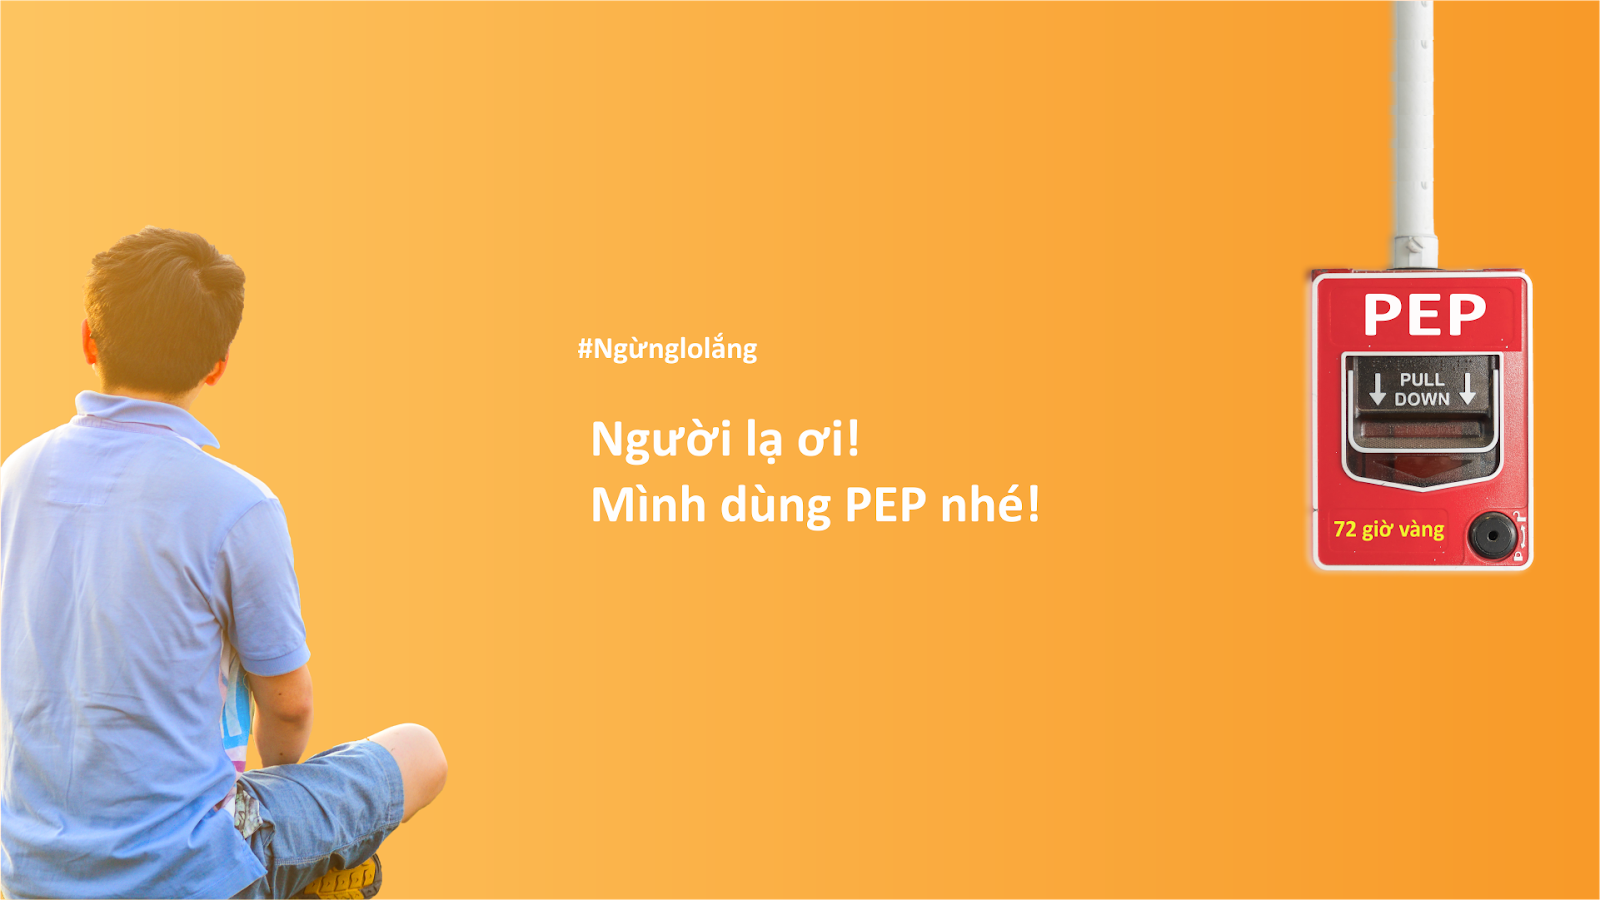 C:\Users\hp\Desktop\PEP.png